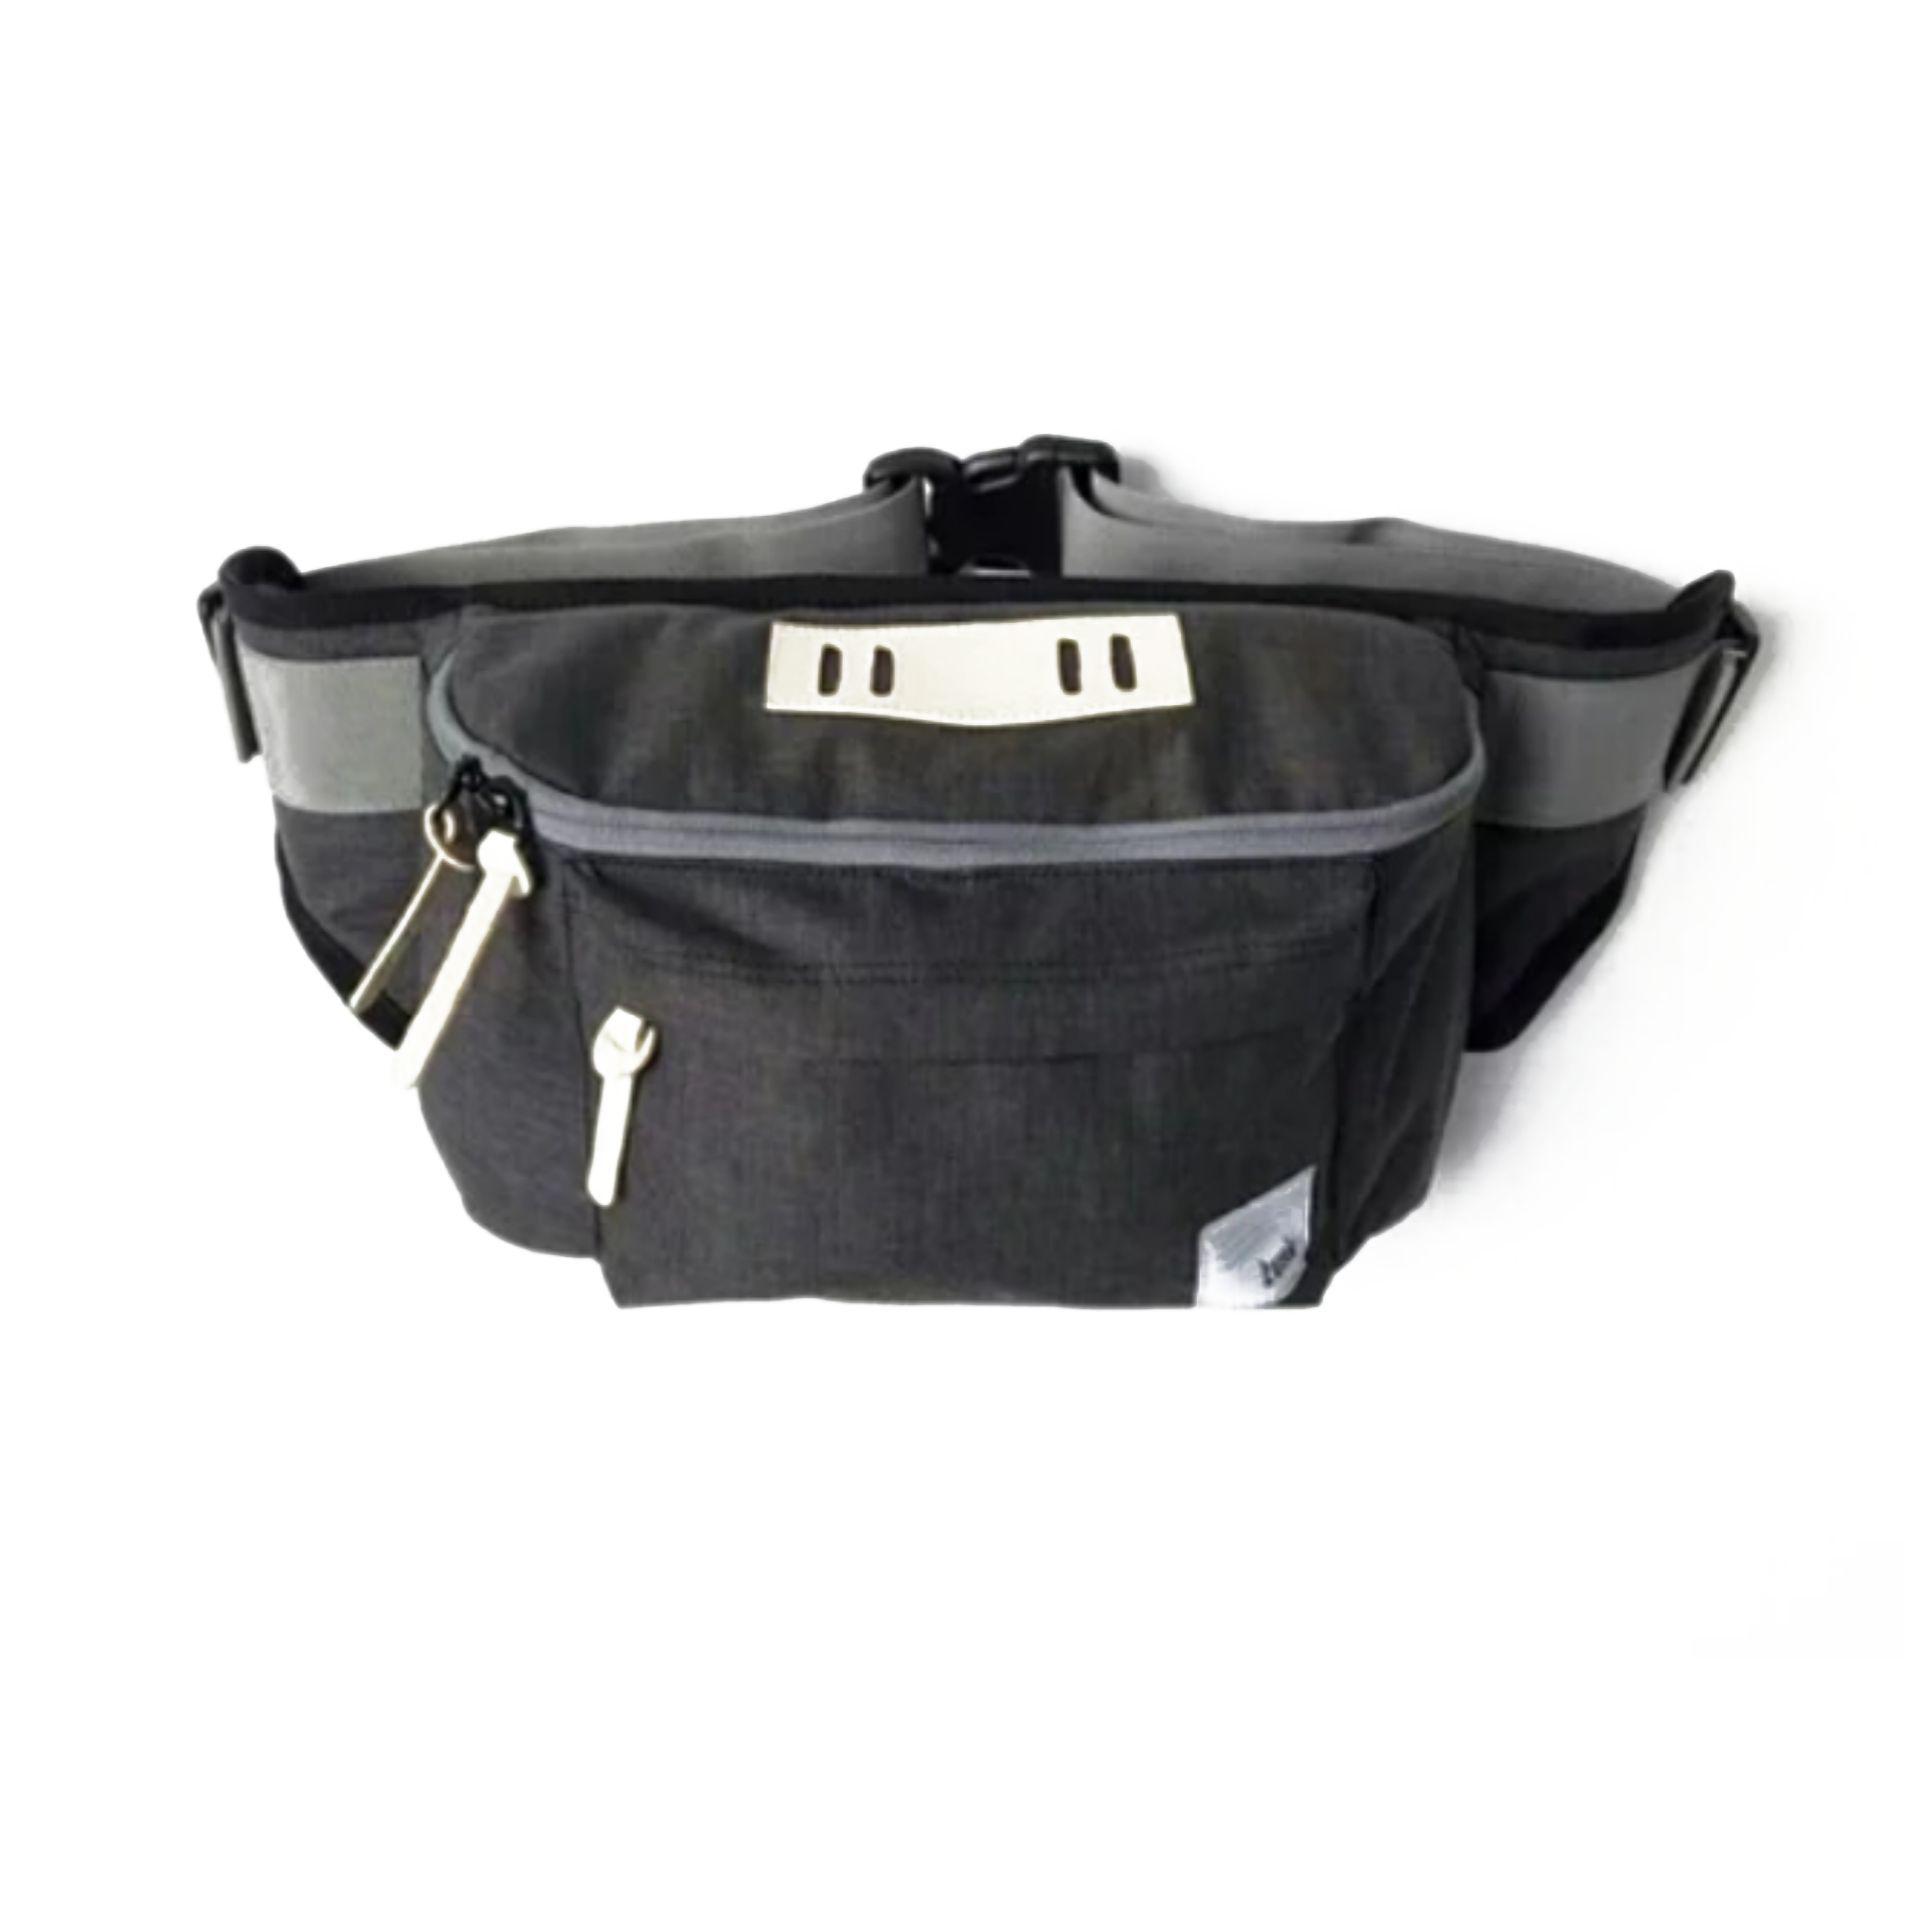 Referensi Harga Tas Distro Restart November 2018 Terkini Pria Original Model Waistbag Bestseller